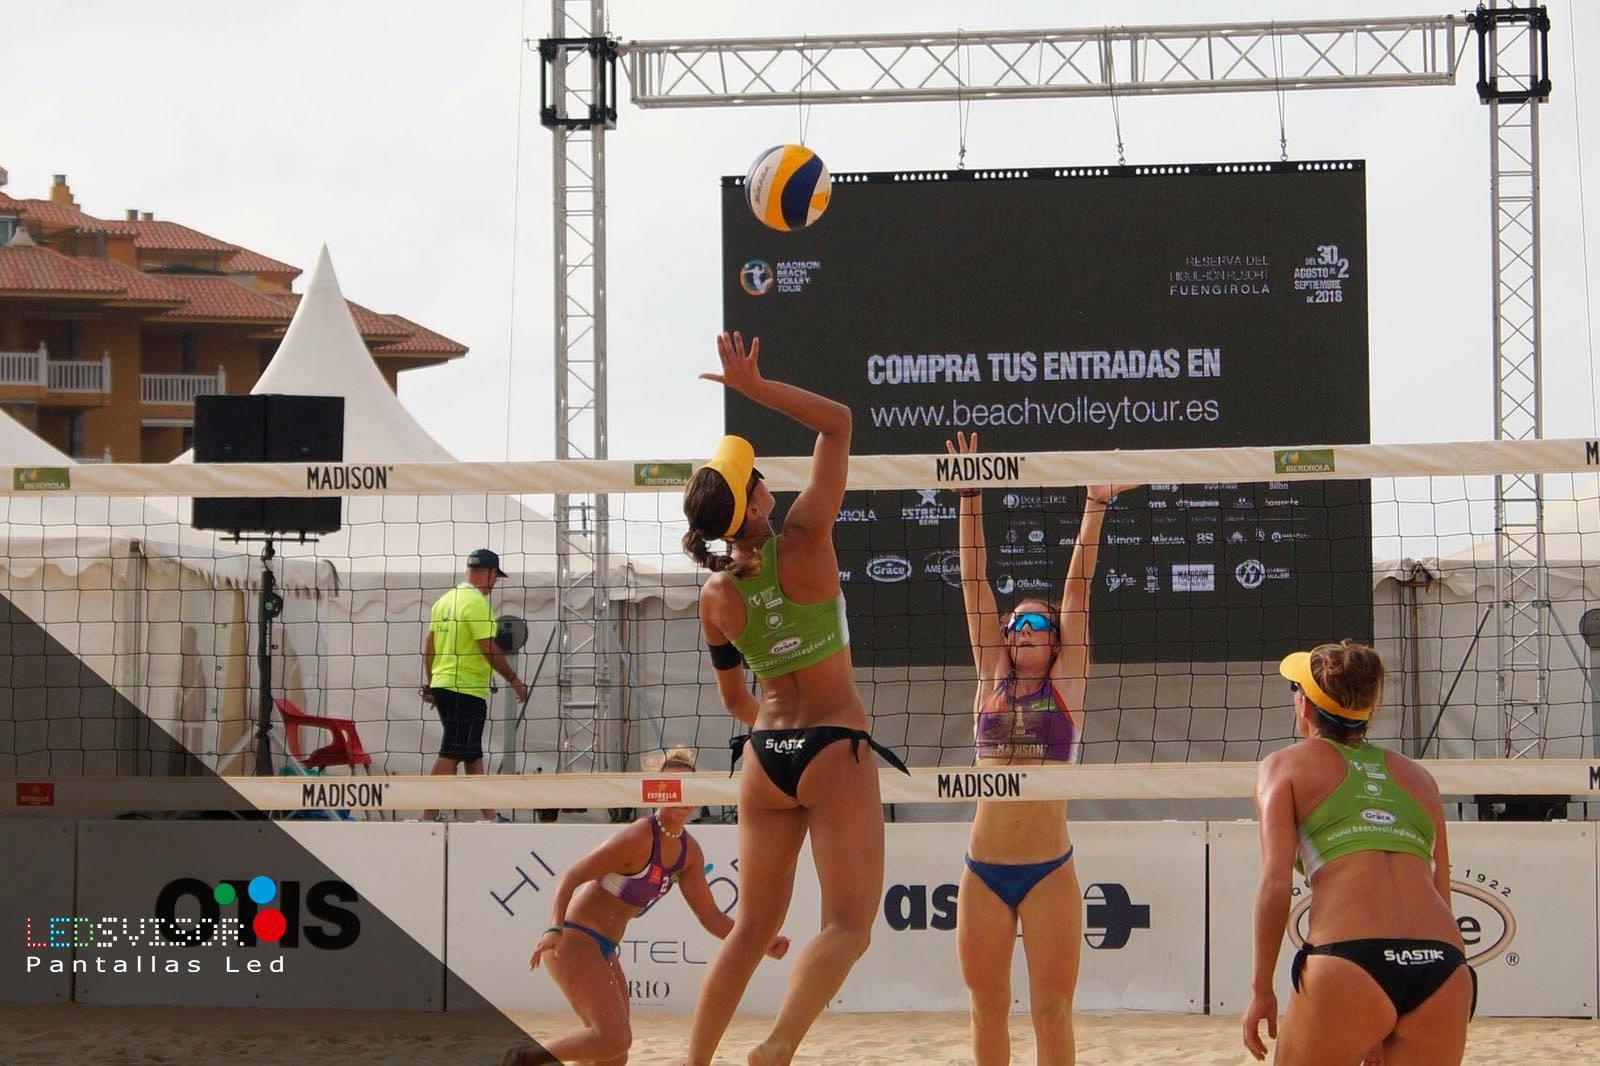 180902-campeonato-voleibol-fuengirola-03